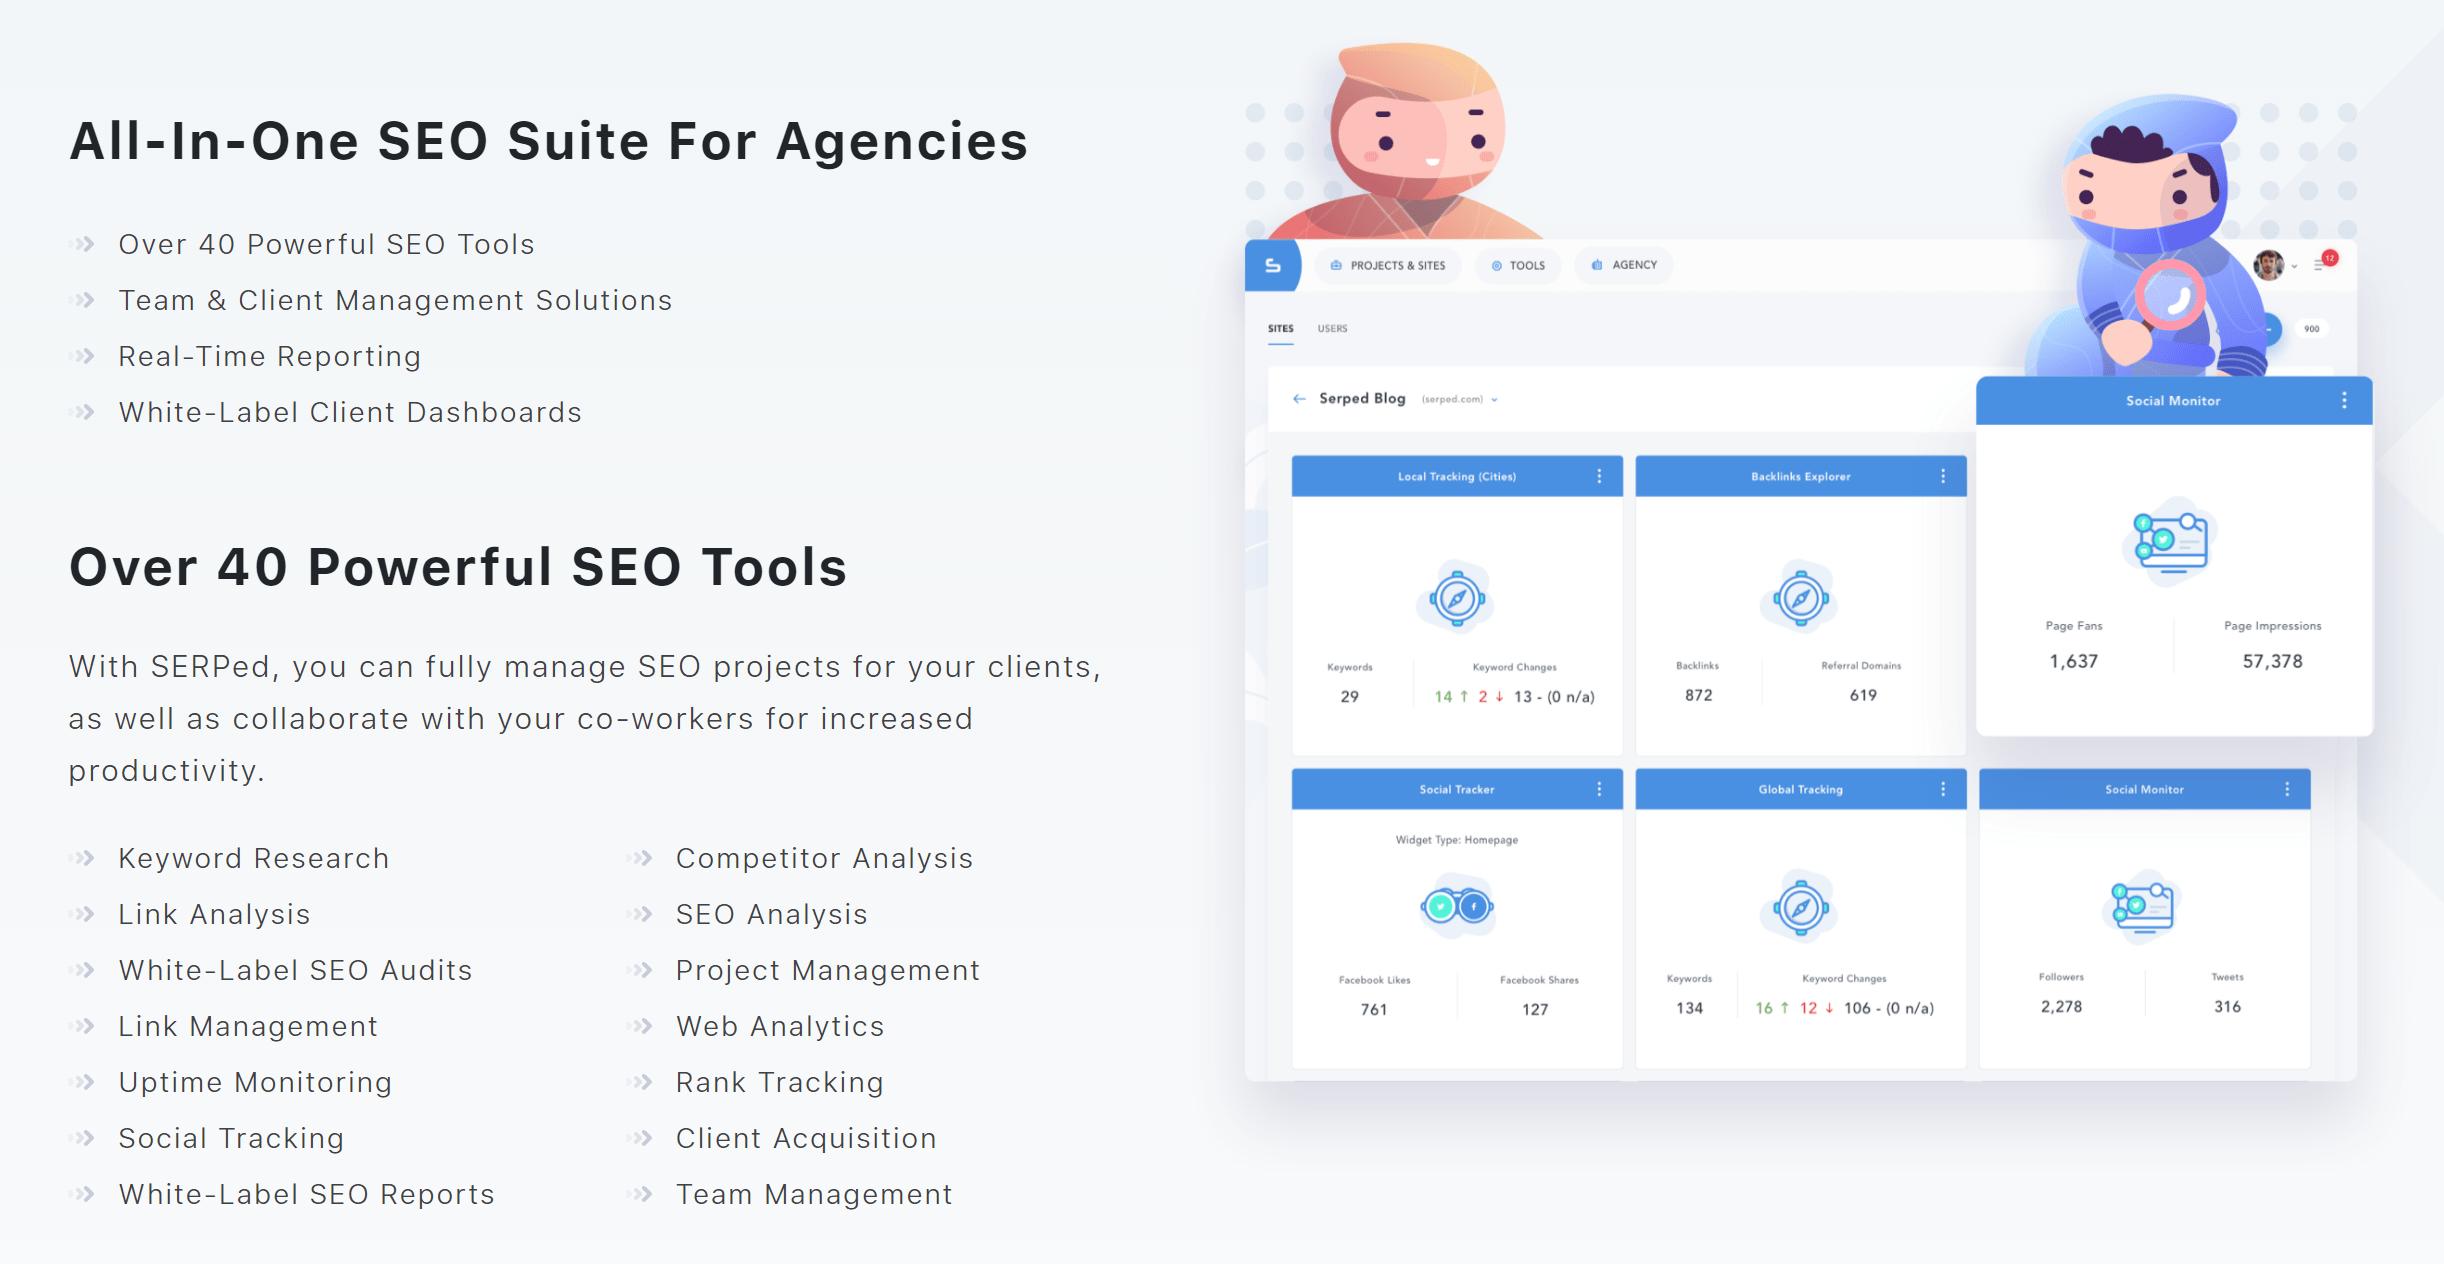 Seo suite for agencies